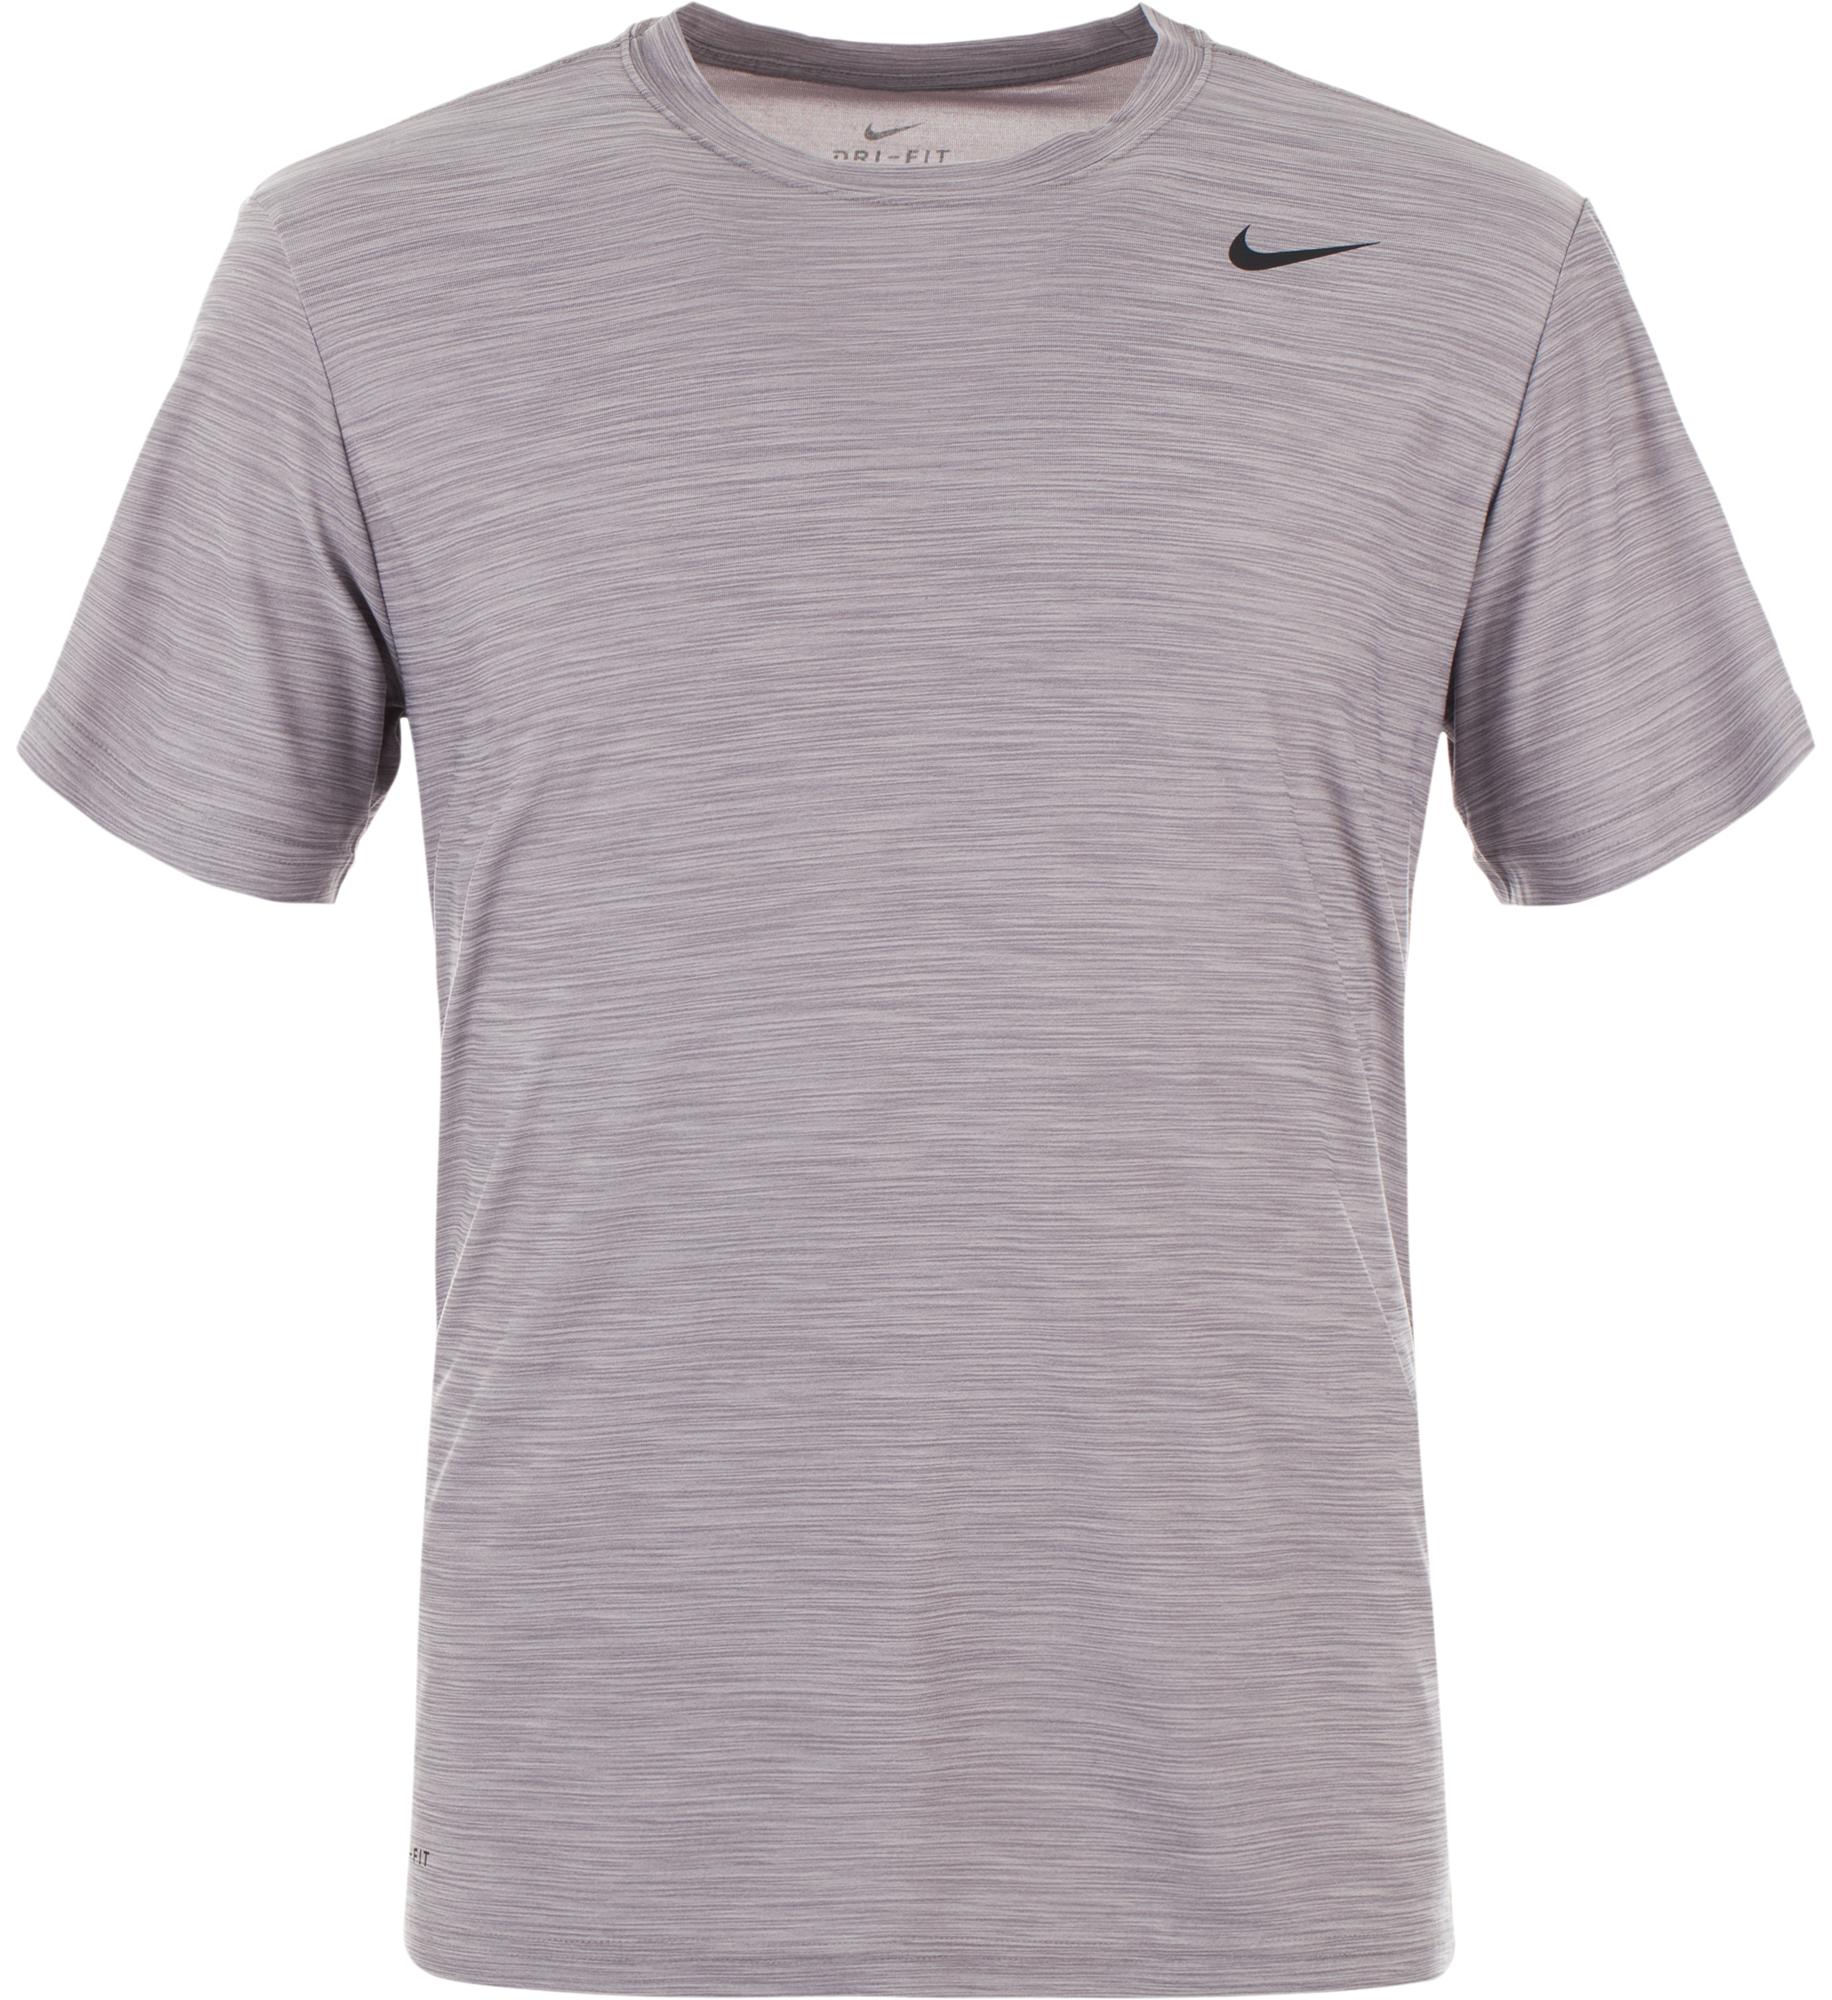 Nike Футболка мужская Nike Dry, размер 44-46